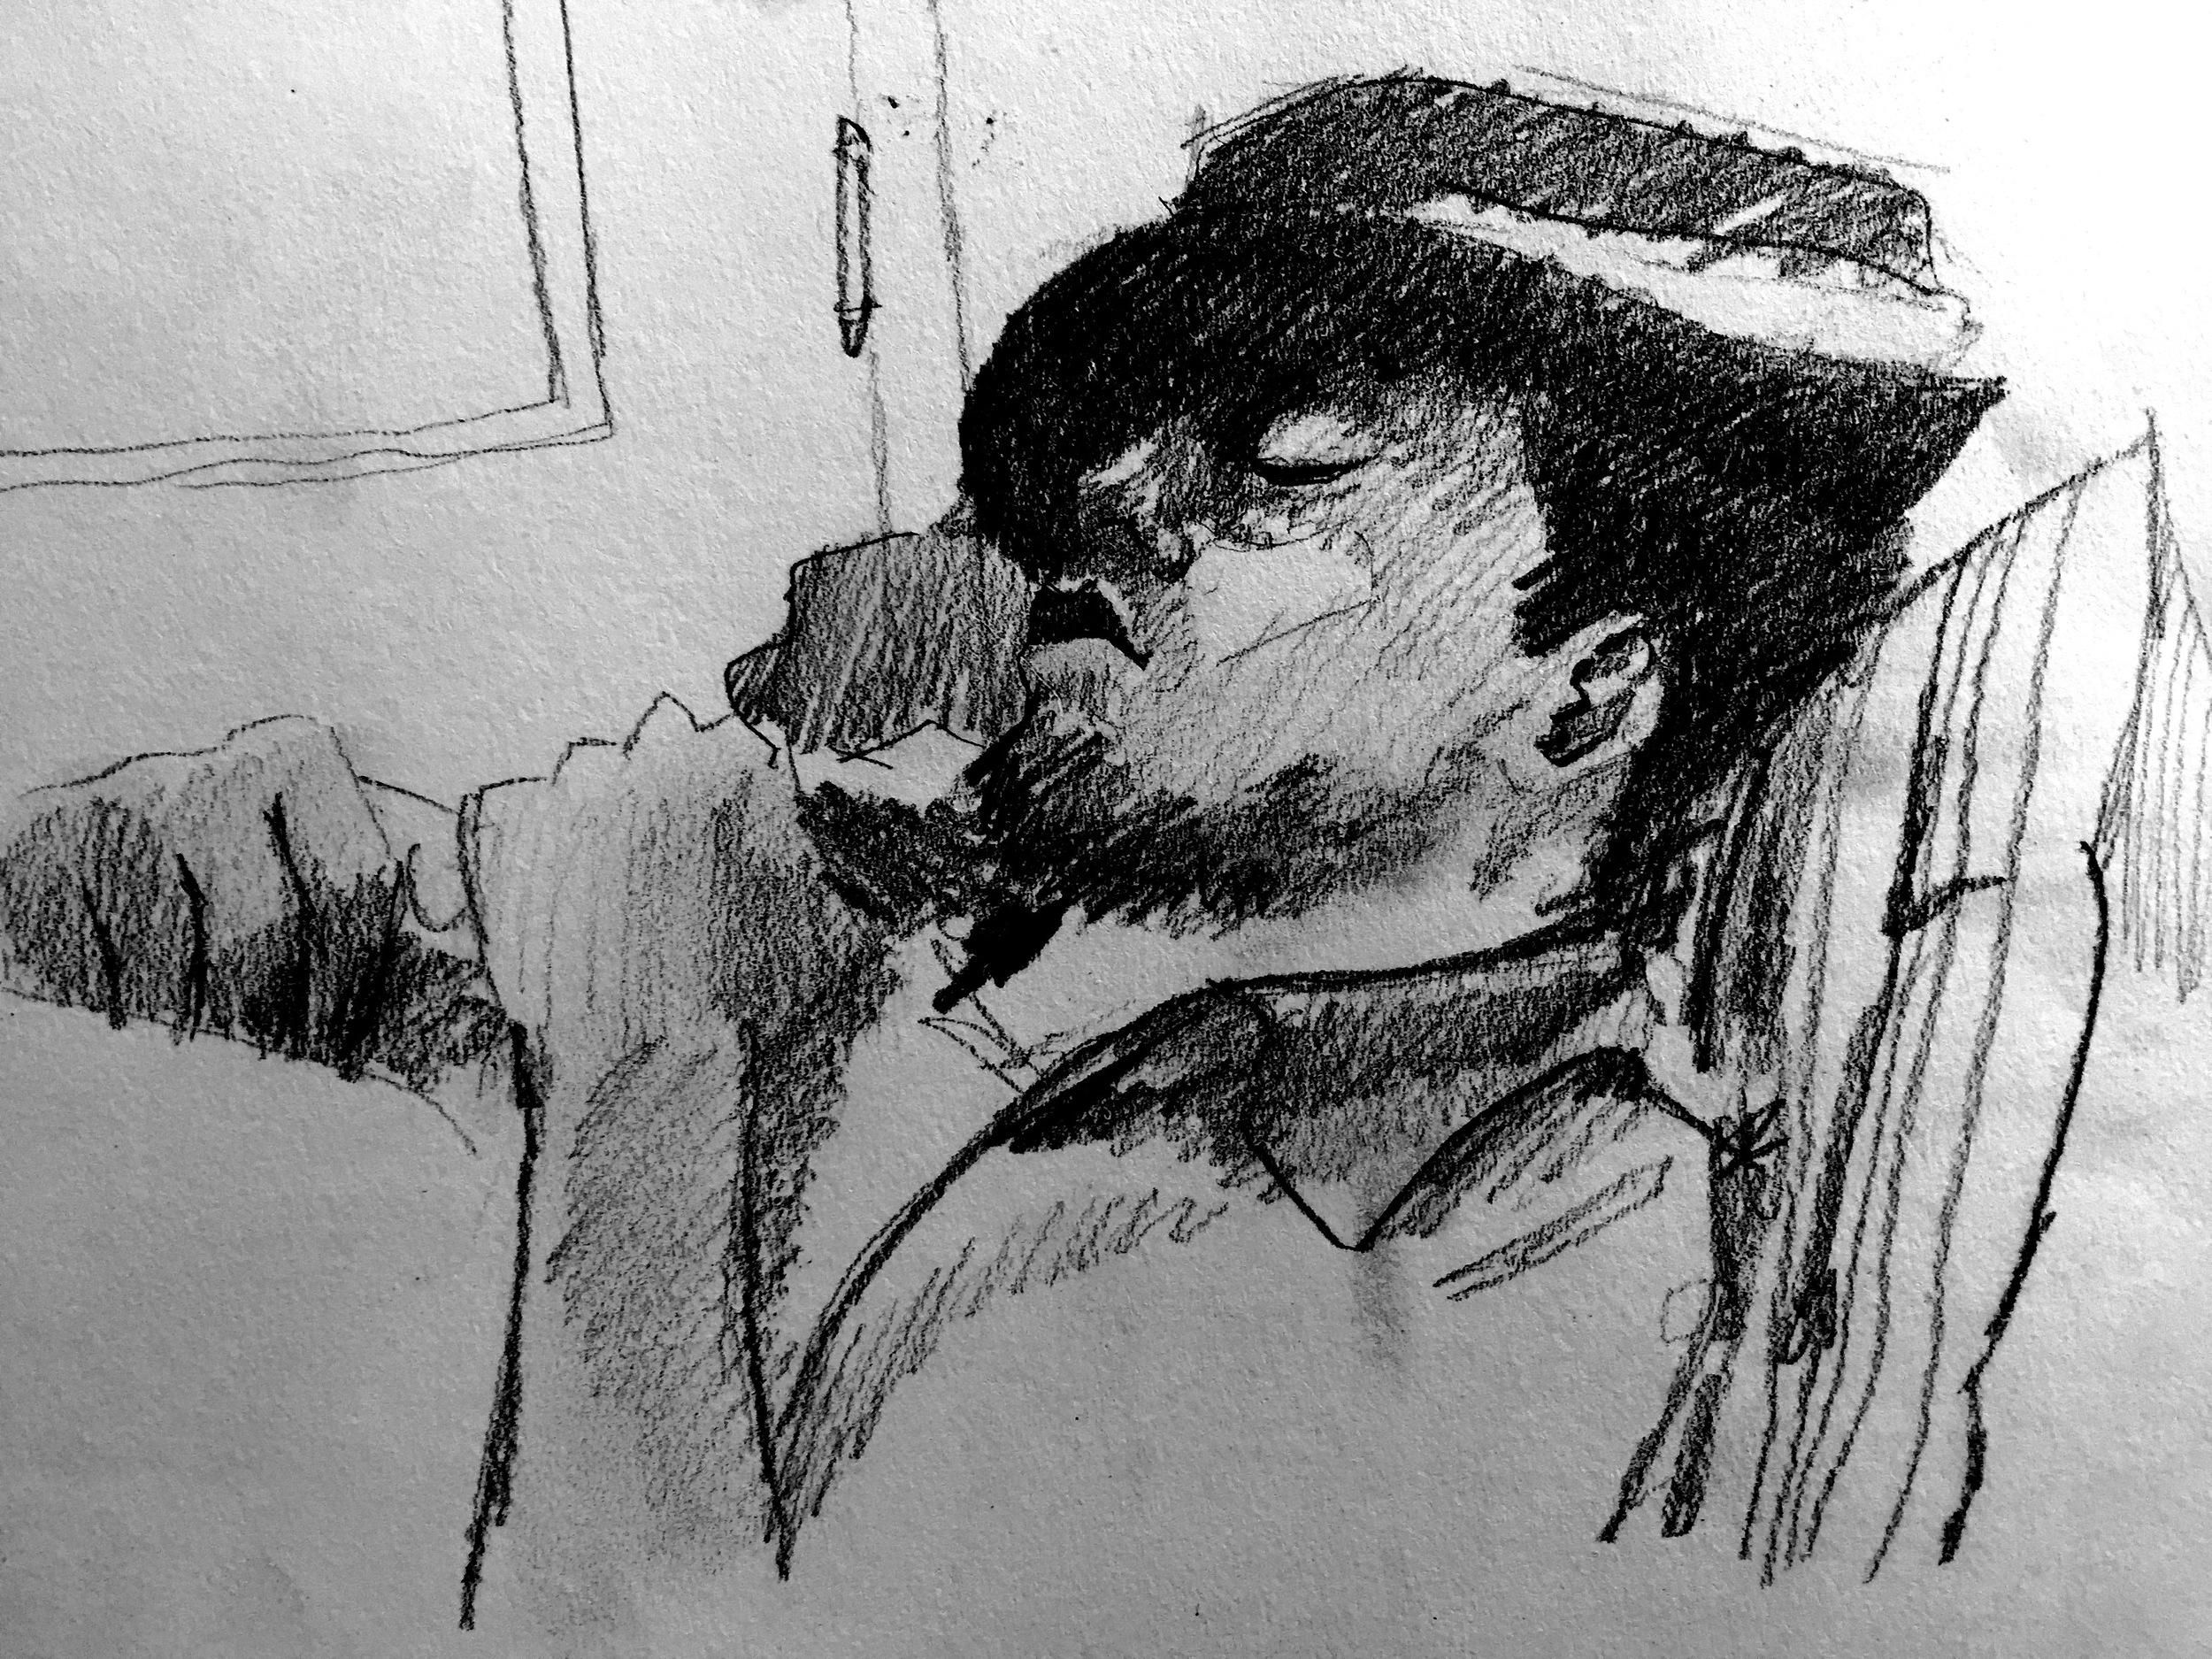 Jesse sleeping in the gallery.